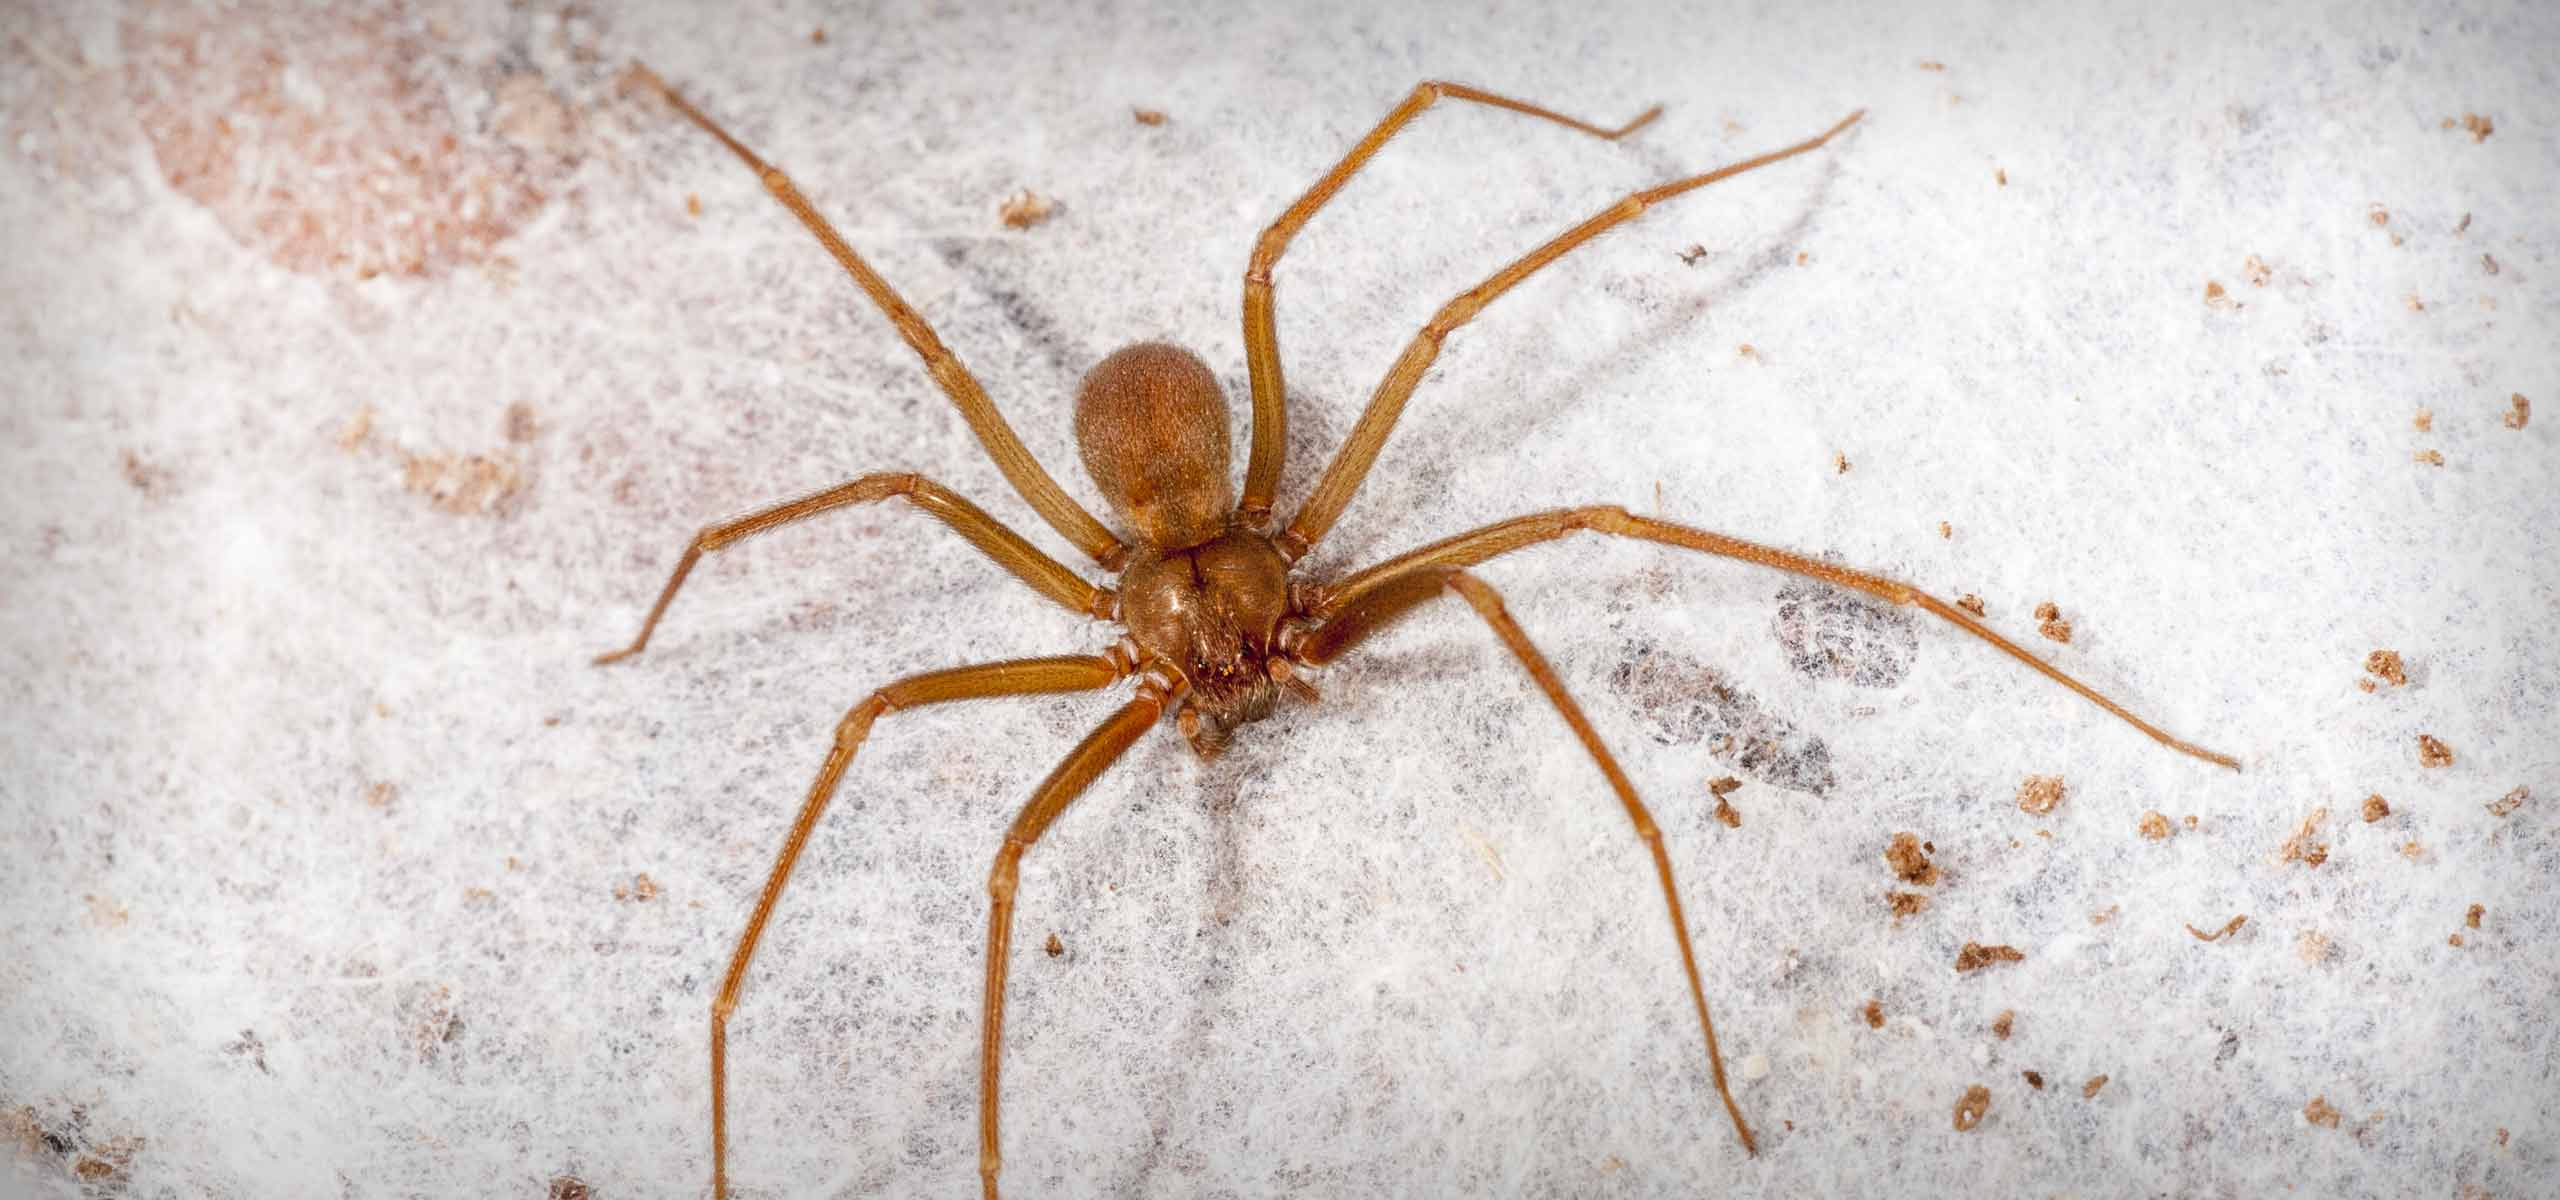 Spider Exterminator | Spider Control Services | Black Pest Prevention